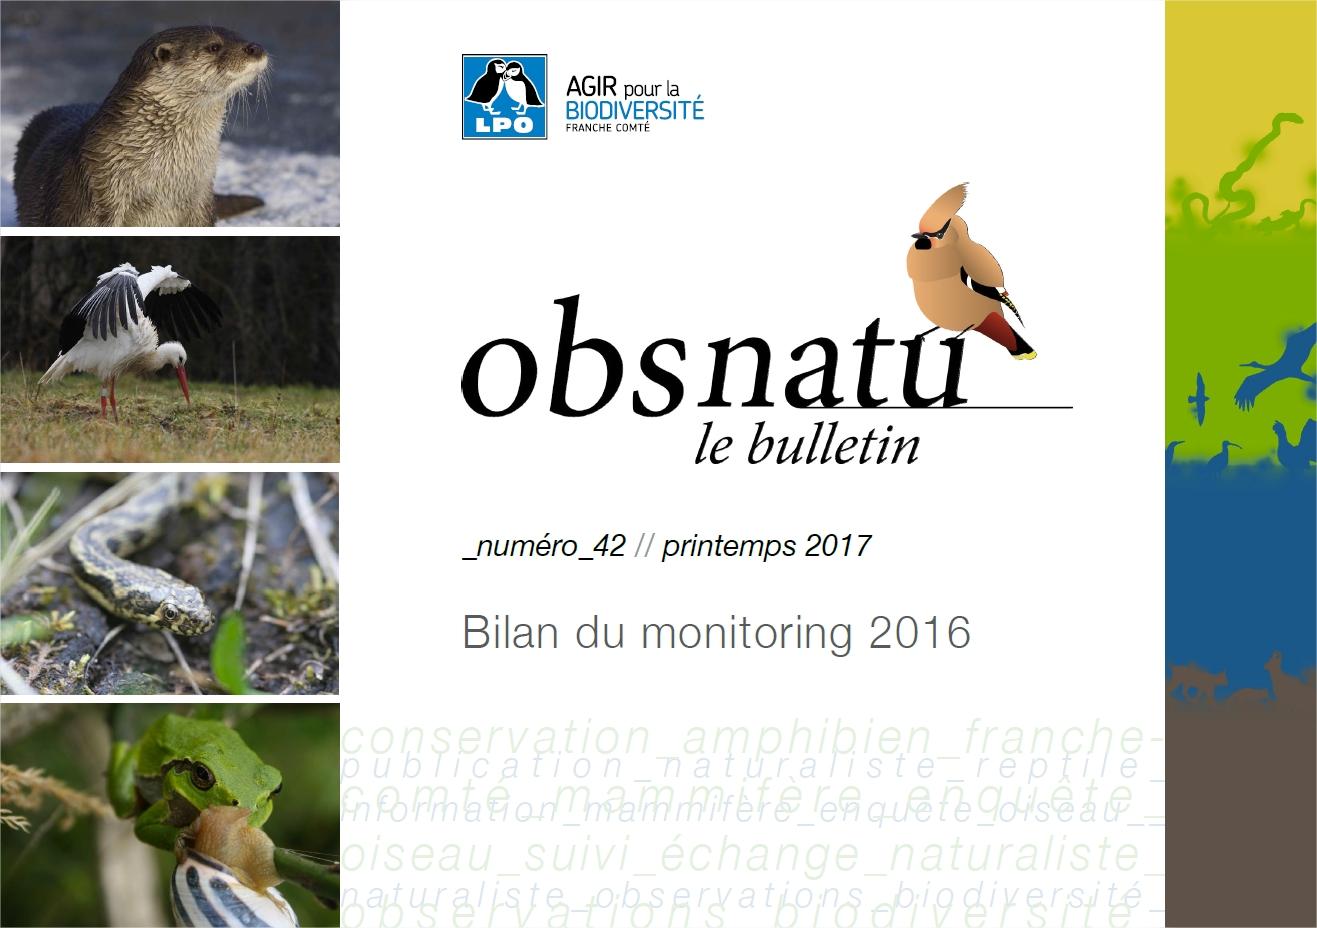 http://files.biolovision.net/franche-comte.lpo.fr/userfiles/publications/Obsnatubulls/obsnatu42printemps2017-monitoring2016vf-copie.pdf